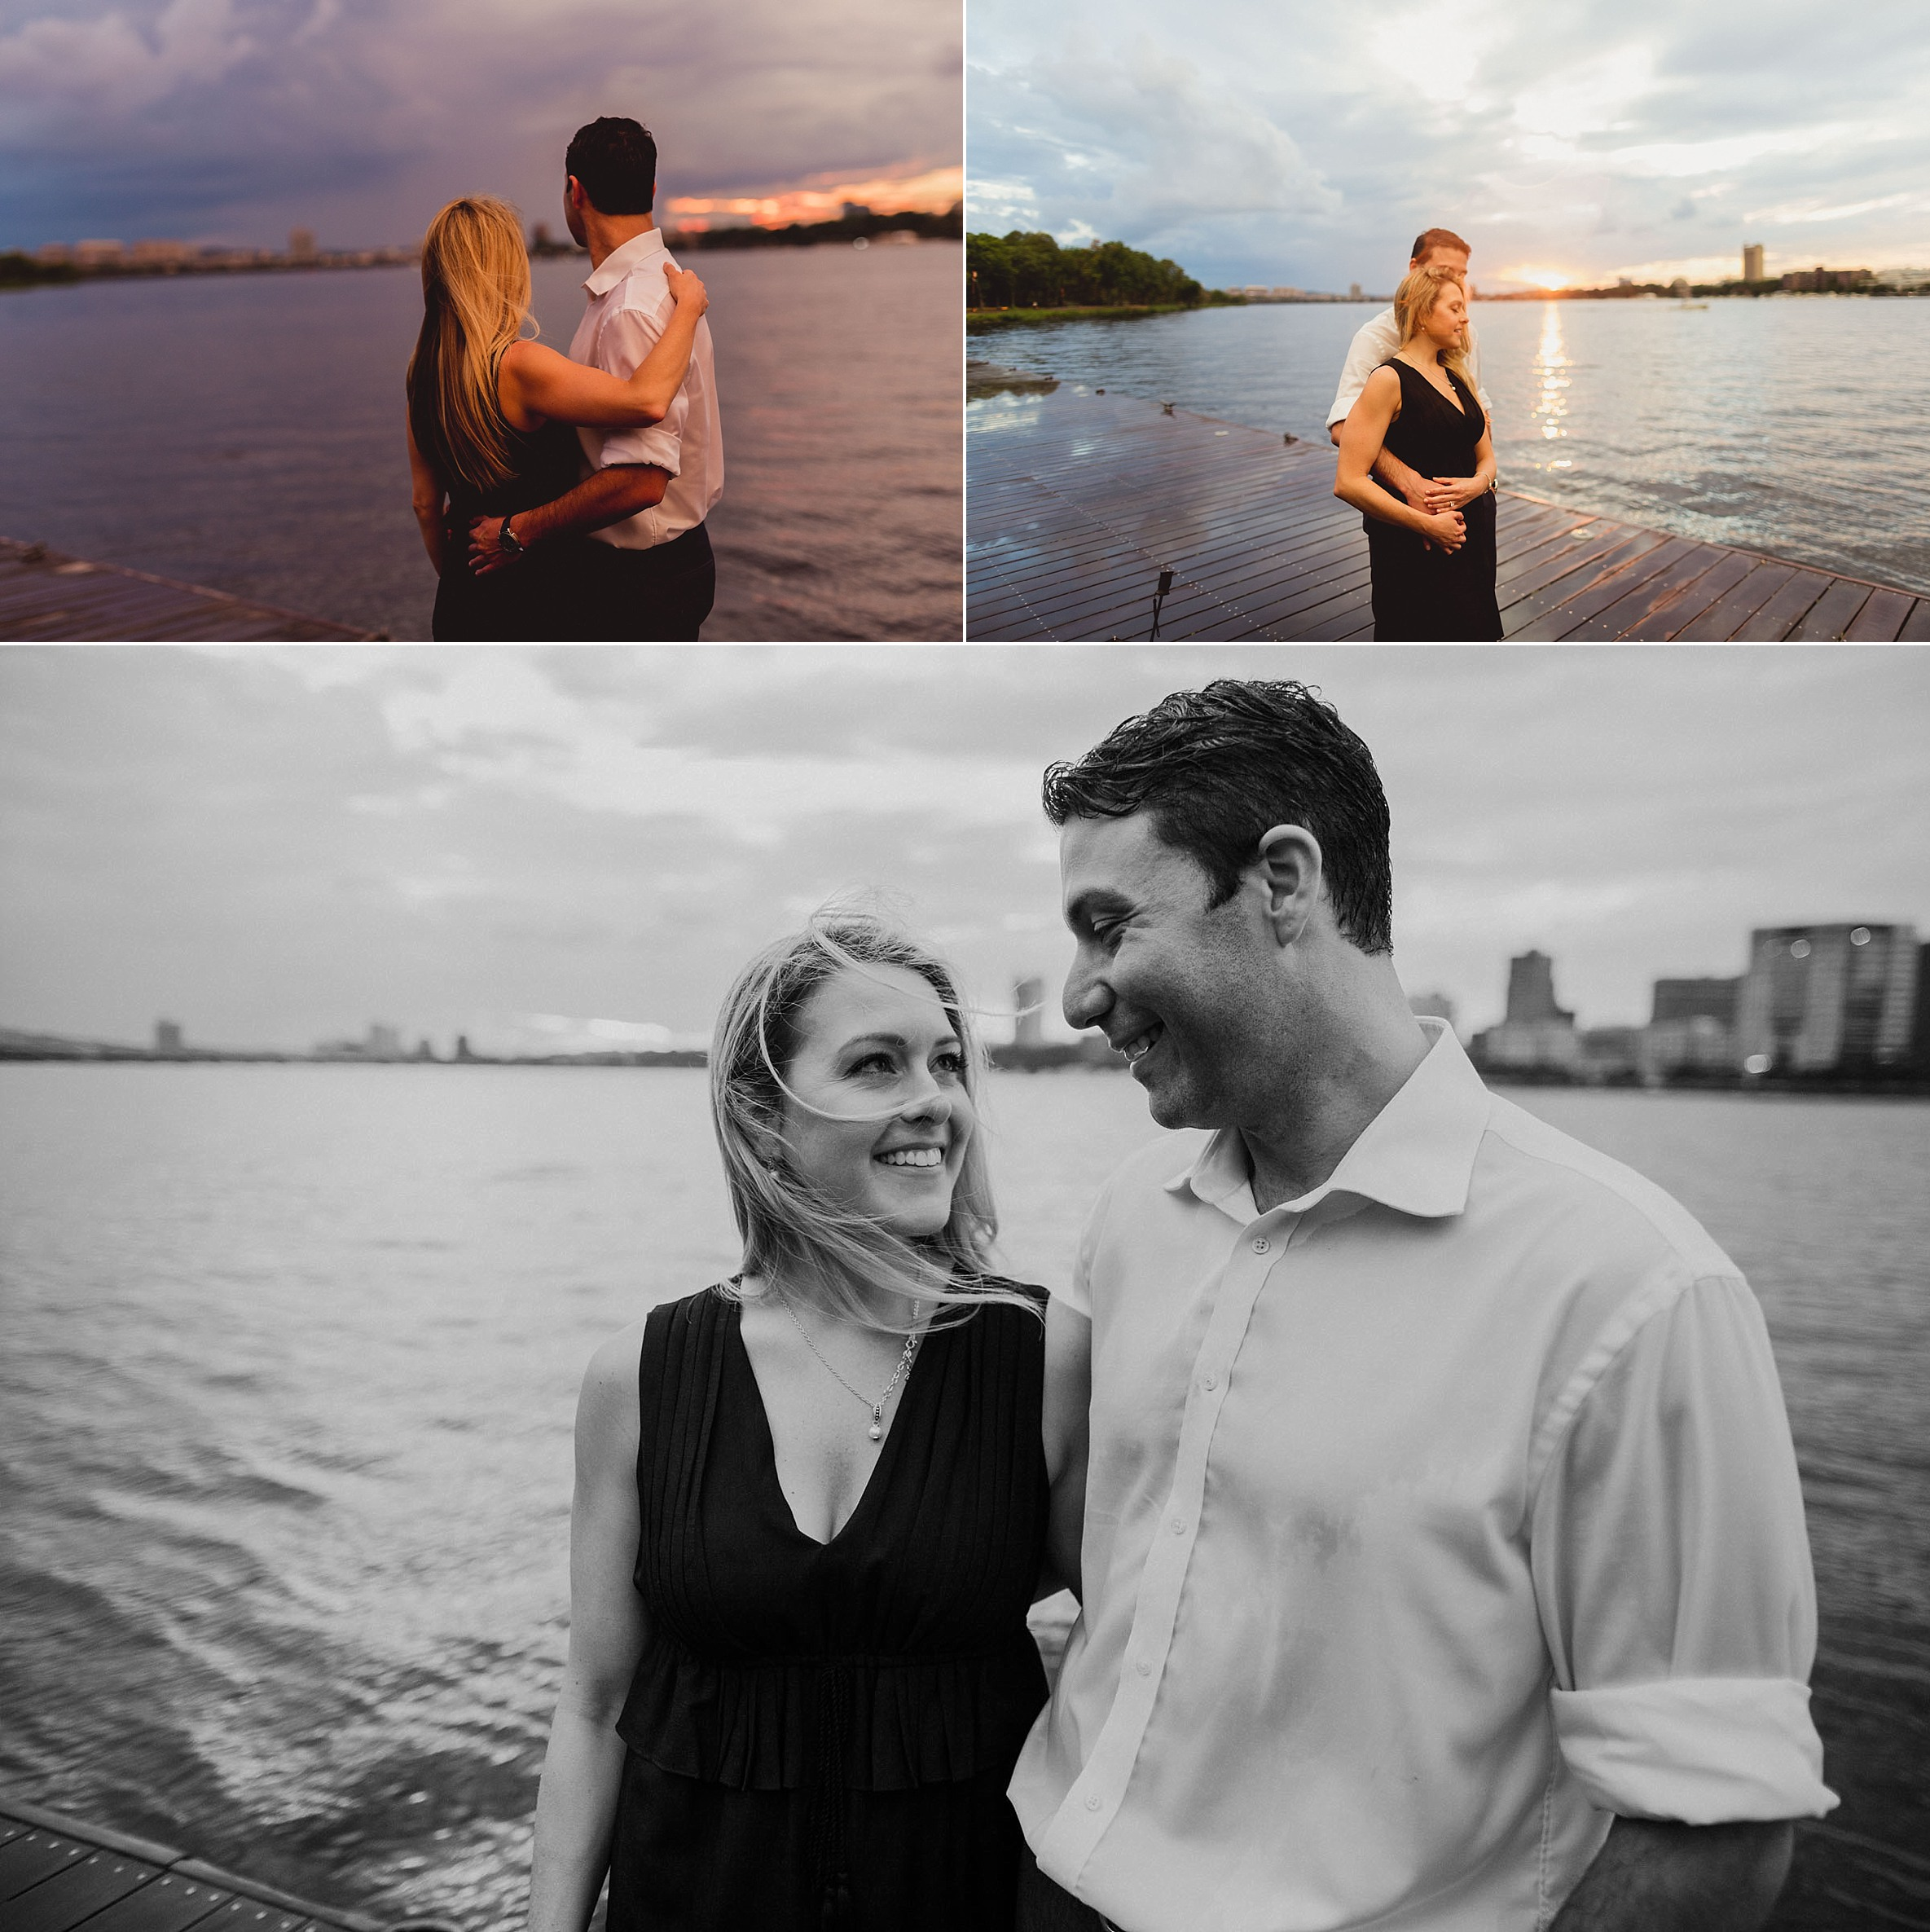 Boston-Engagment-photography-4-2.jpg